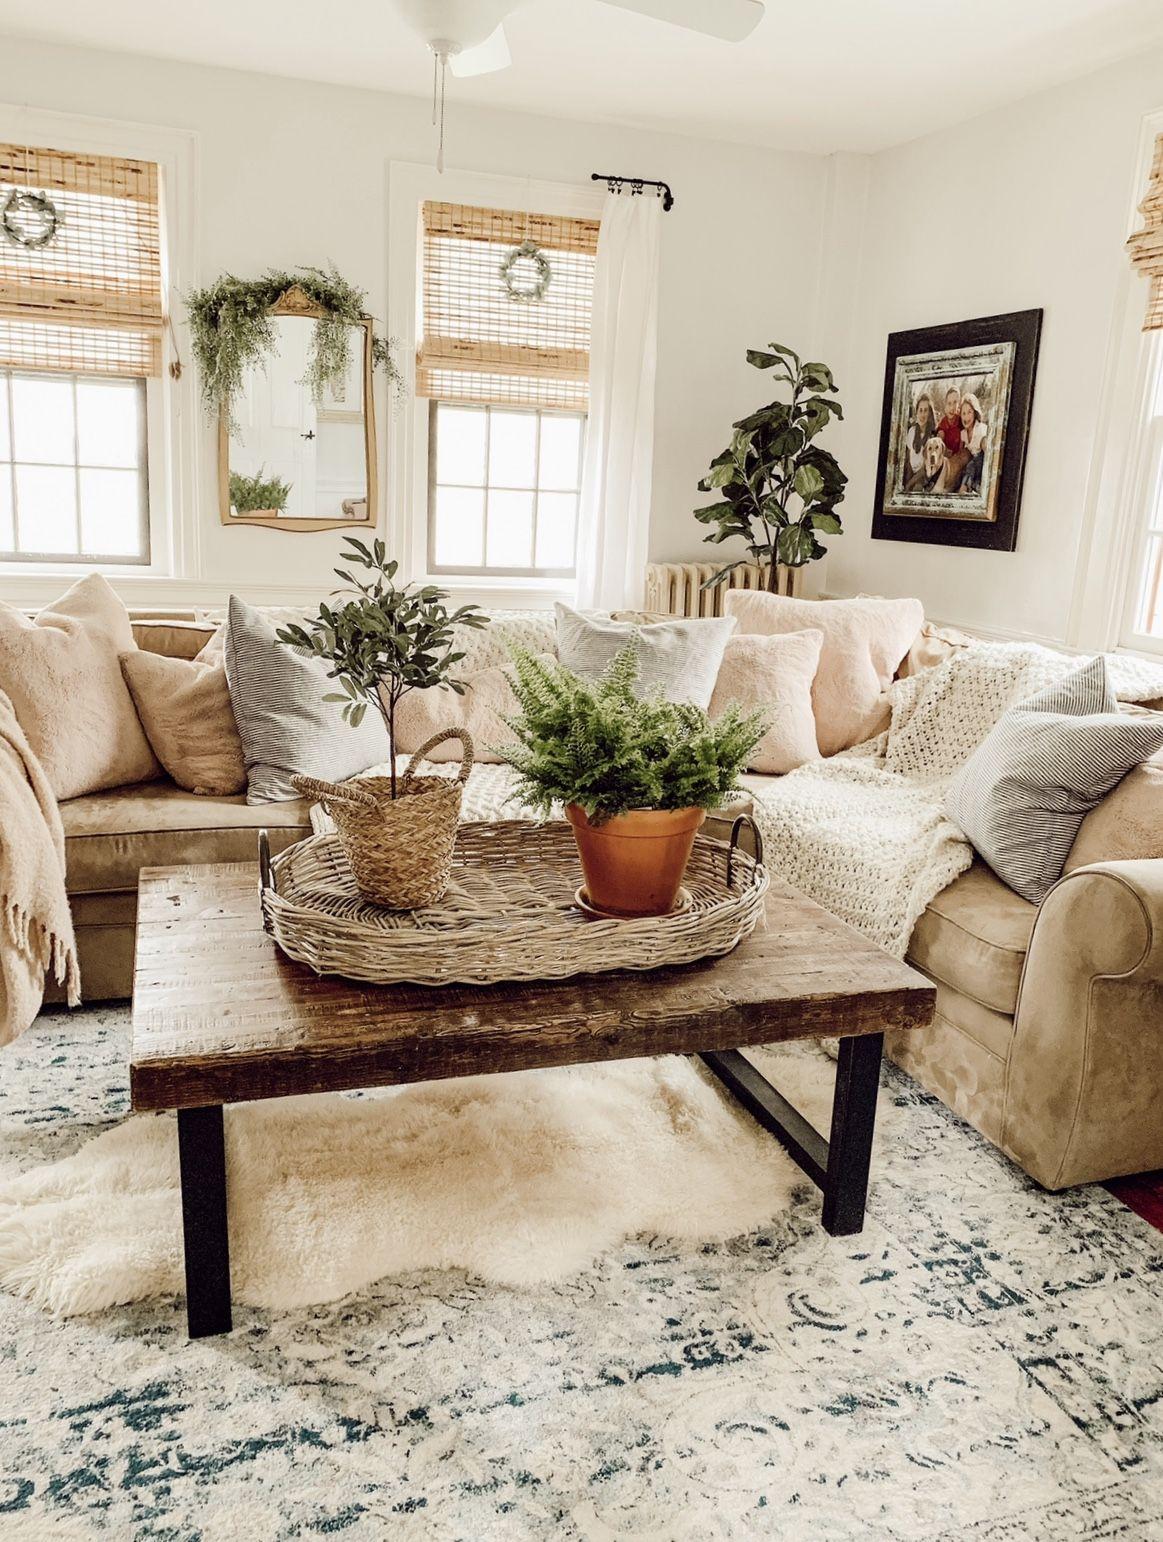 Vintage Farmhouse Rustic Living Room Beige Living Room Decor Cream Color Living Room Blue And Cream Living Room